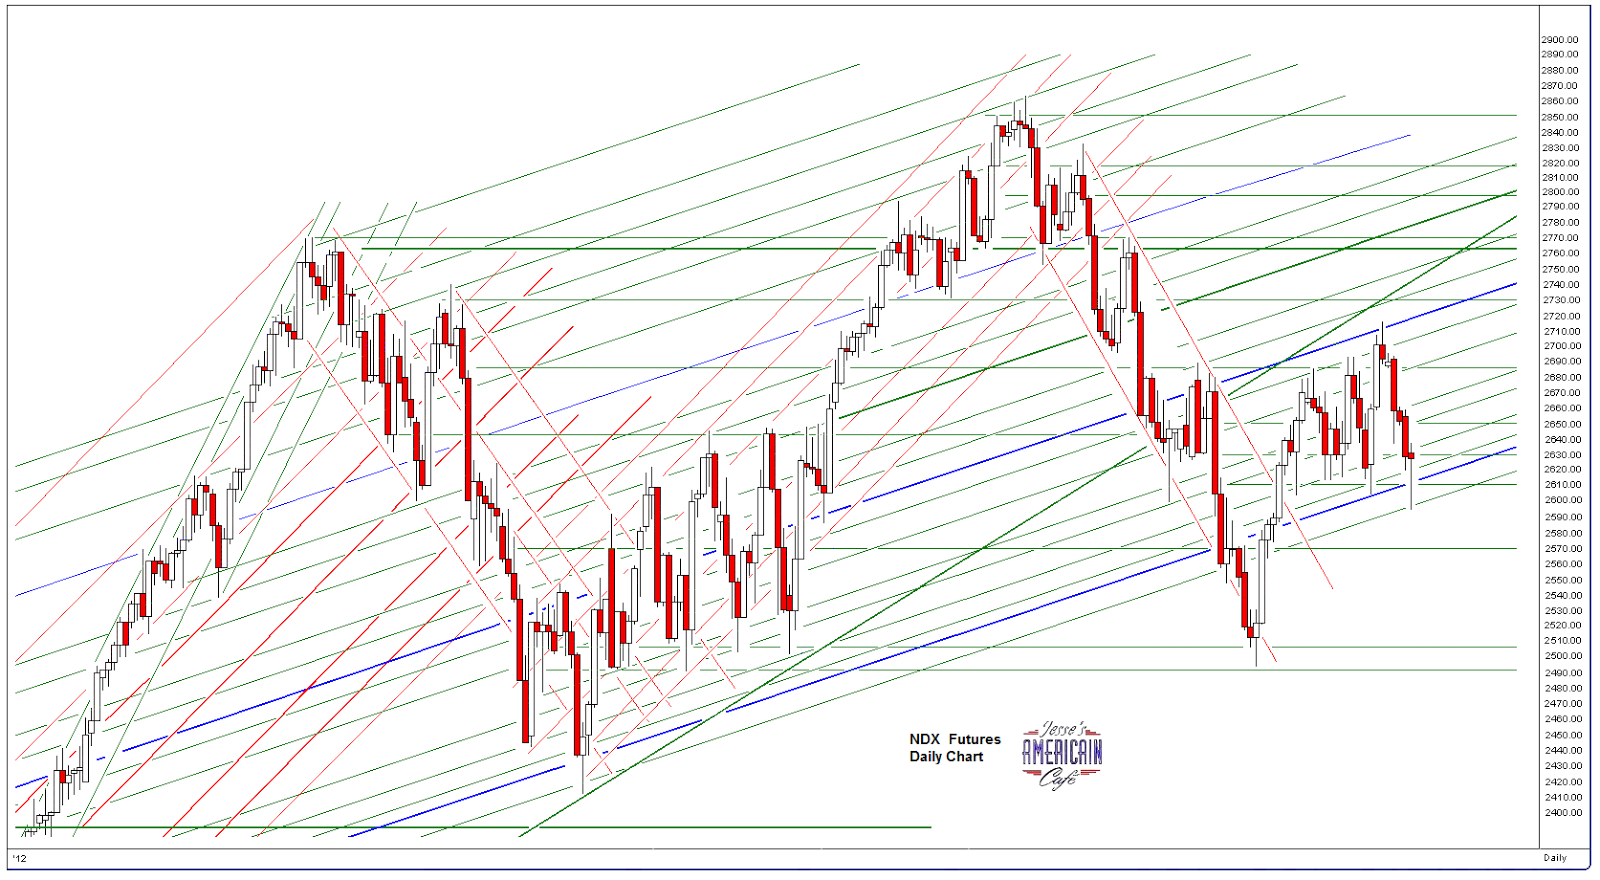 stock-channel.net - Das Finanzportal - Scary?! ...stay nimble